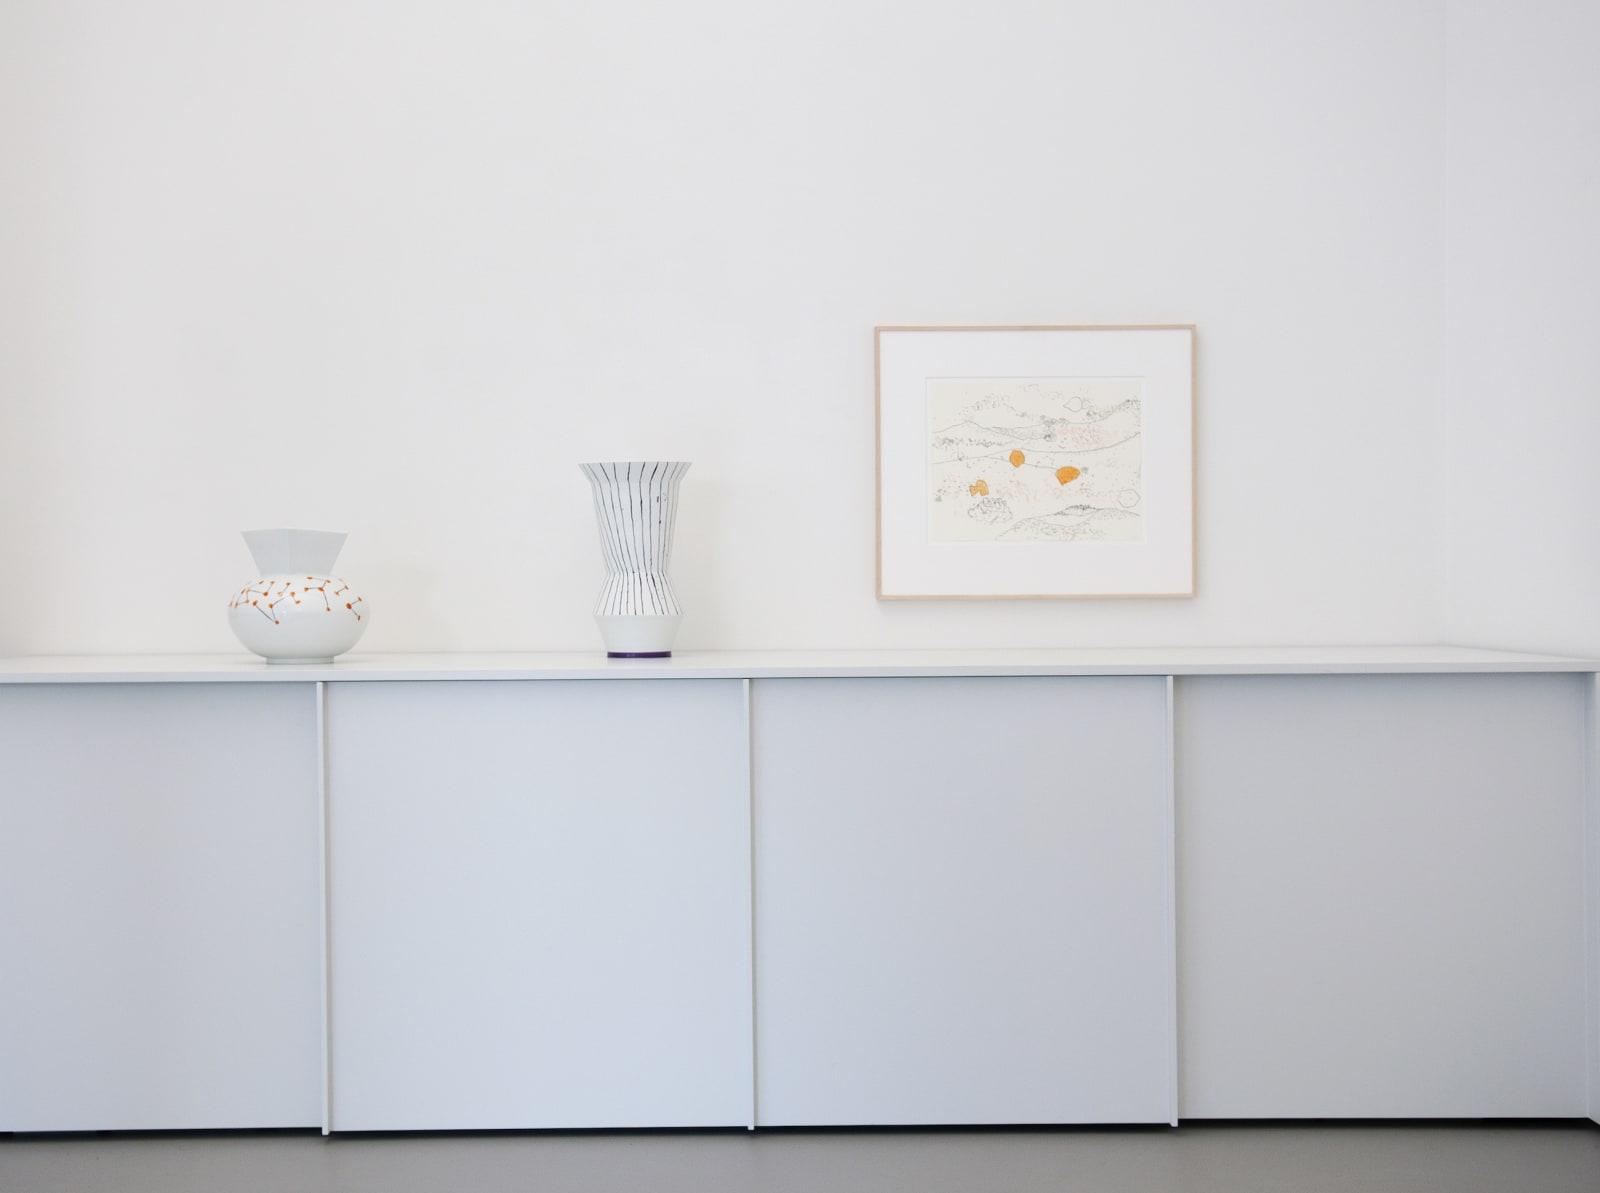 Installation view, Galerie Onrust, Amsterdam (2012) | Photo: Jaring Lokhorst